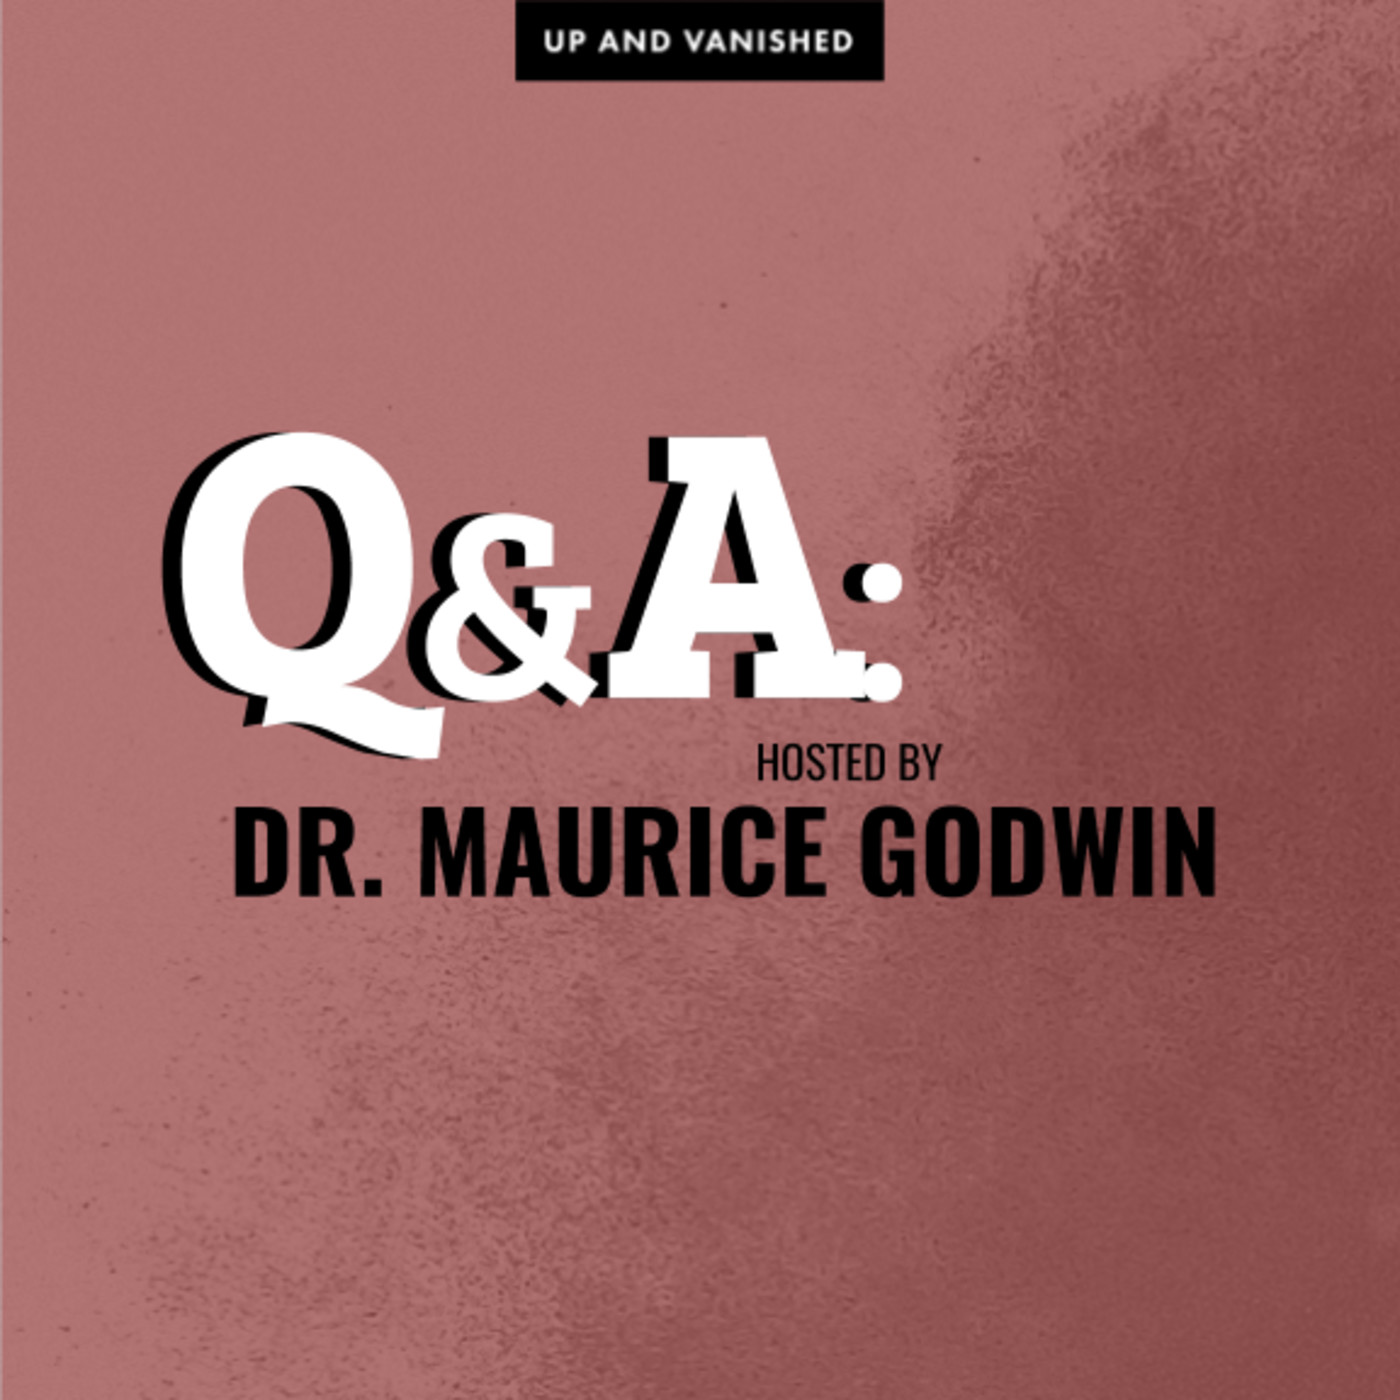 S1E : Q&A with Dr. Maurice Godwin 01.19.17